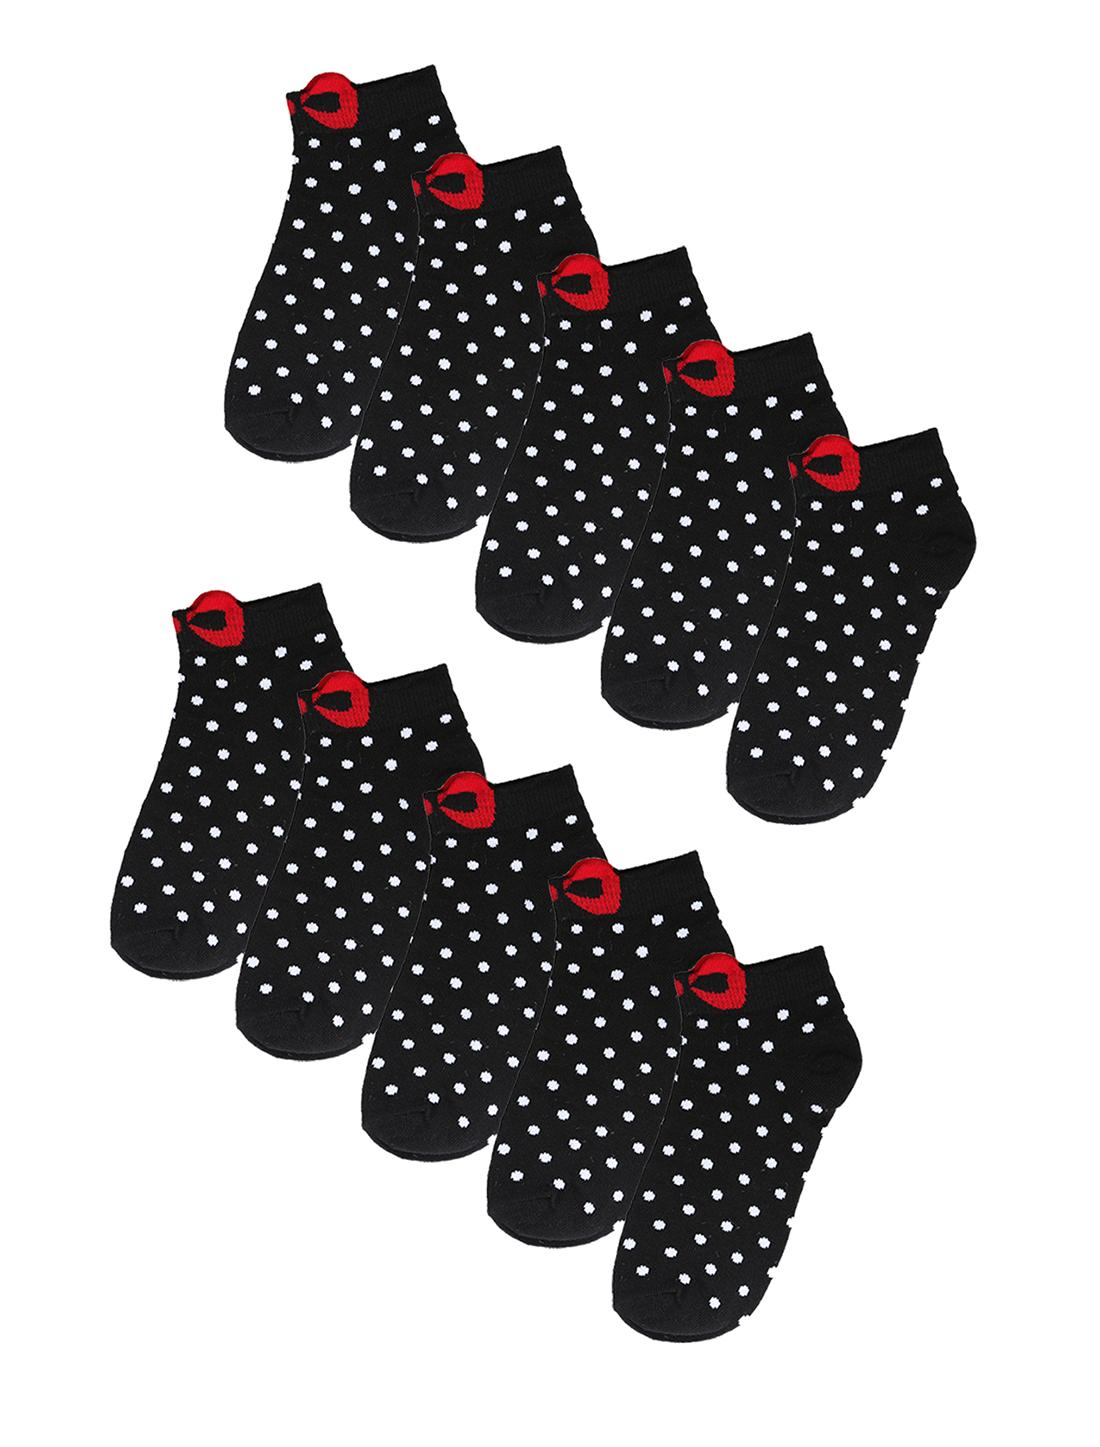 Women Cotton Dots Bowknot No Show Boat Socks 10 Pack 7-9 Black